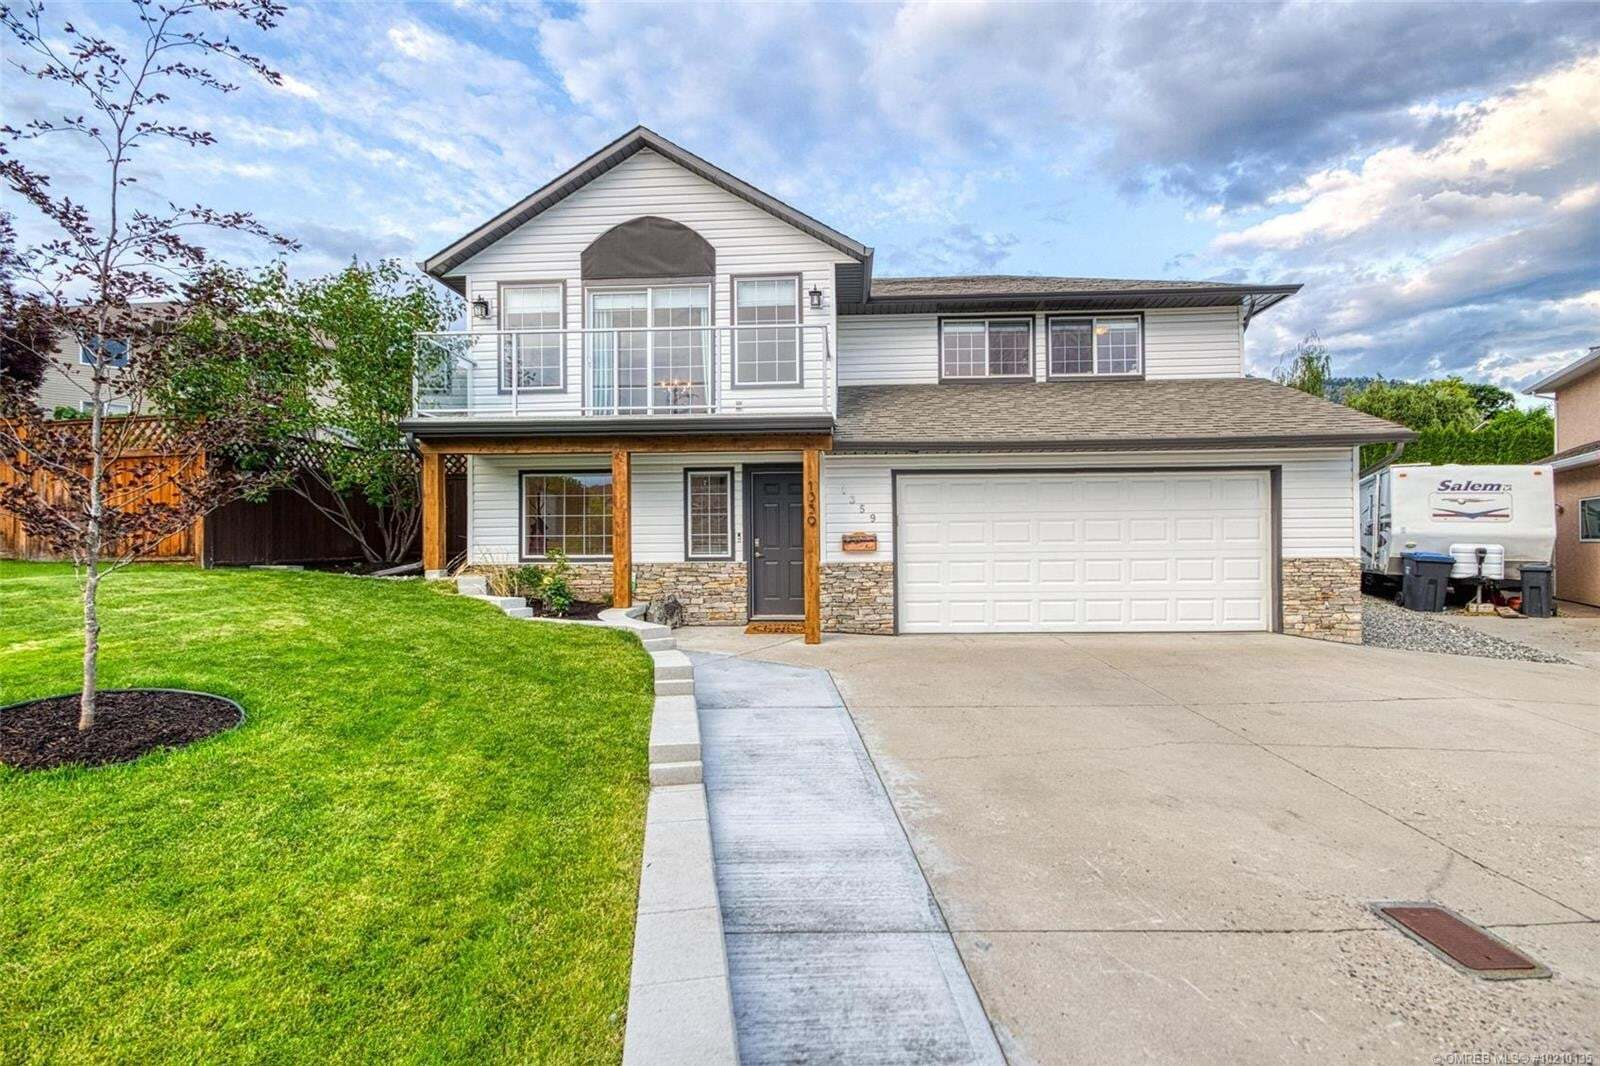 House for sale at 1359 Loseth Dr Kelowna British Columbia - MLS: 10210135